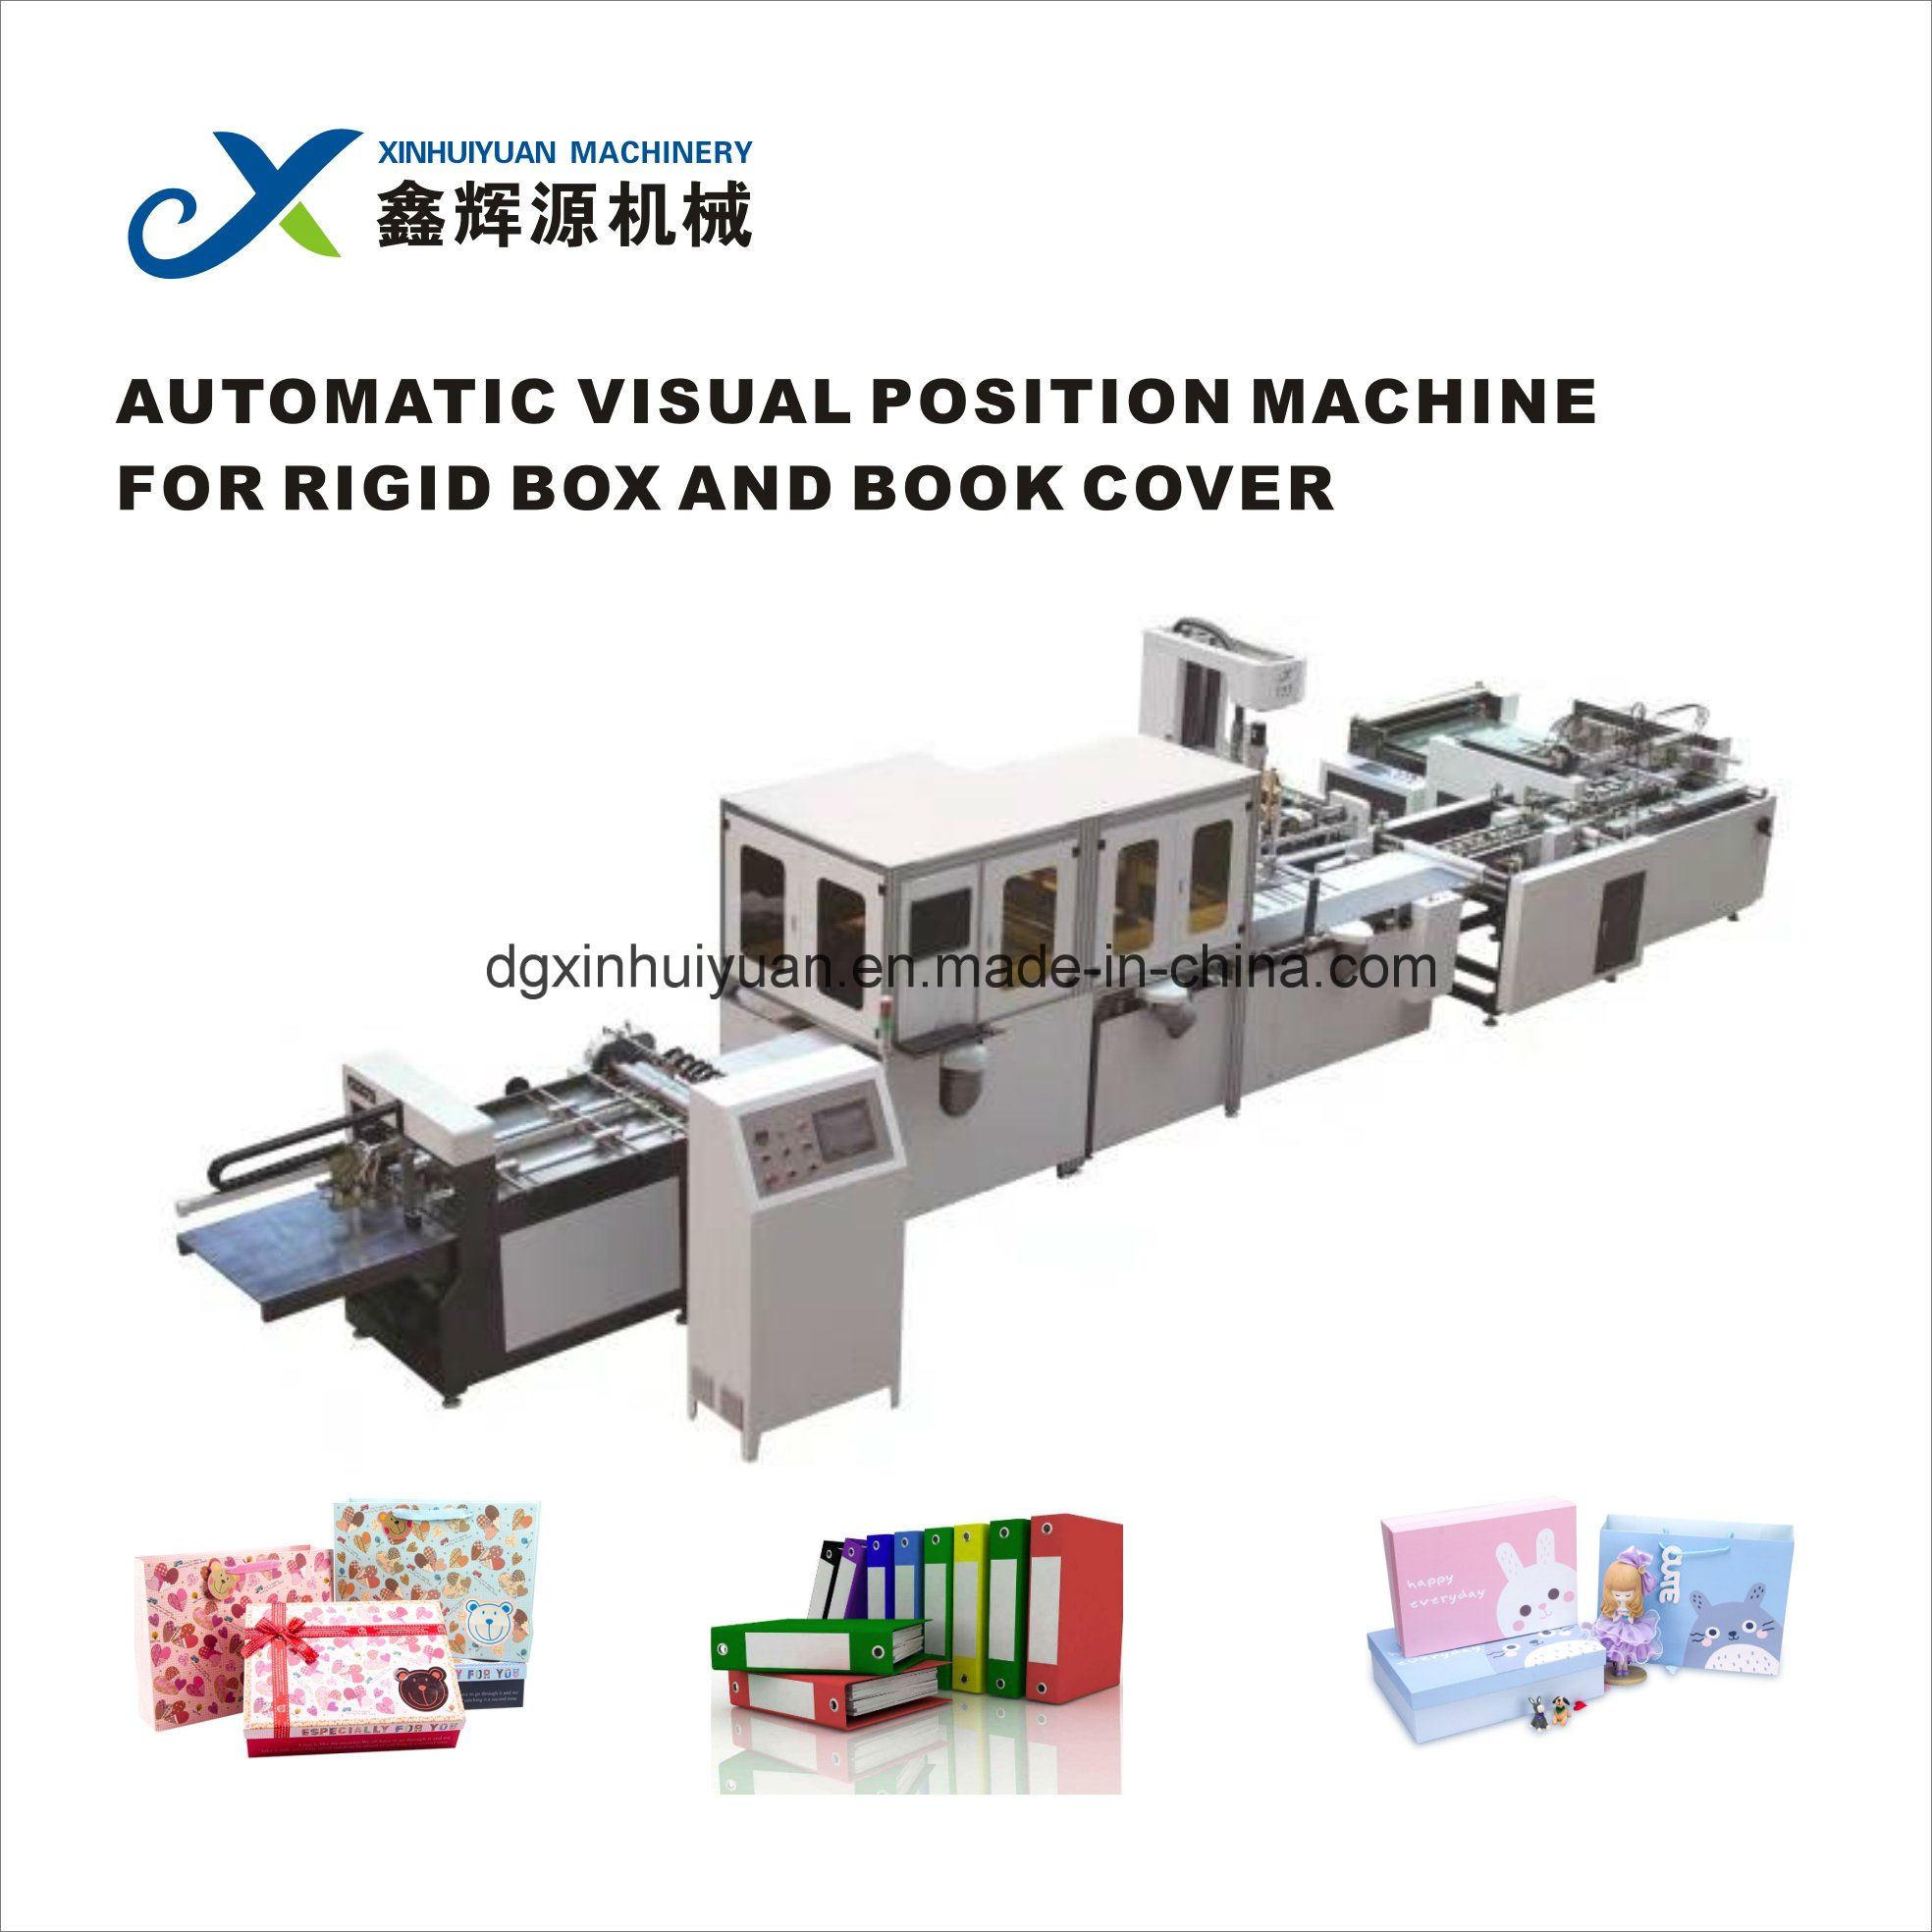 China Xy 400t Hard Cover And Rigid Box Visual Positioning Machine